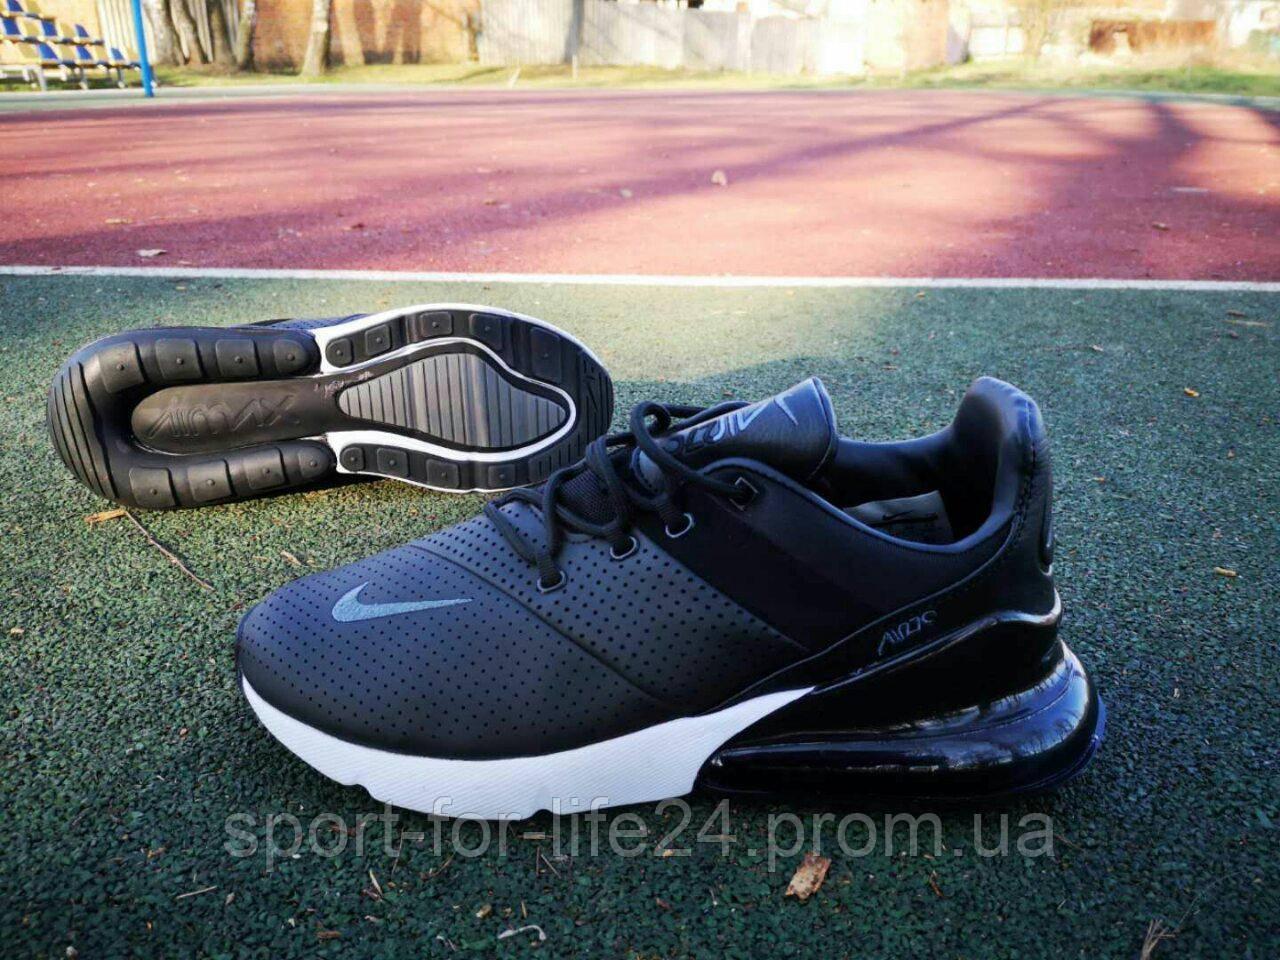 74b3bdfb Мужские кроссовки Nike Air Max 270 кожаные (реплика ААА) - Sport for Life в